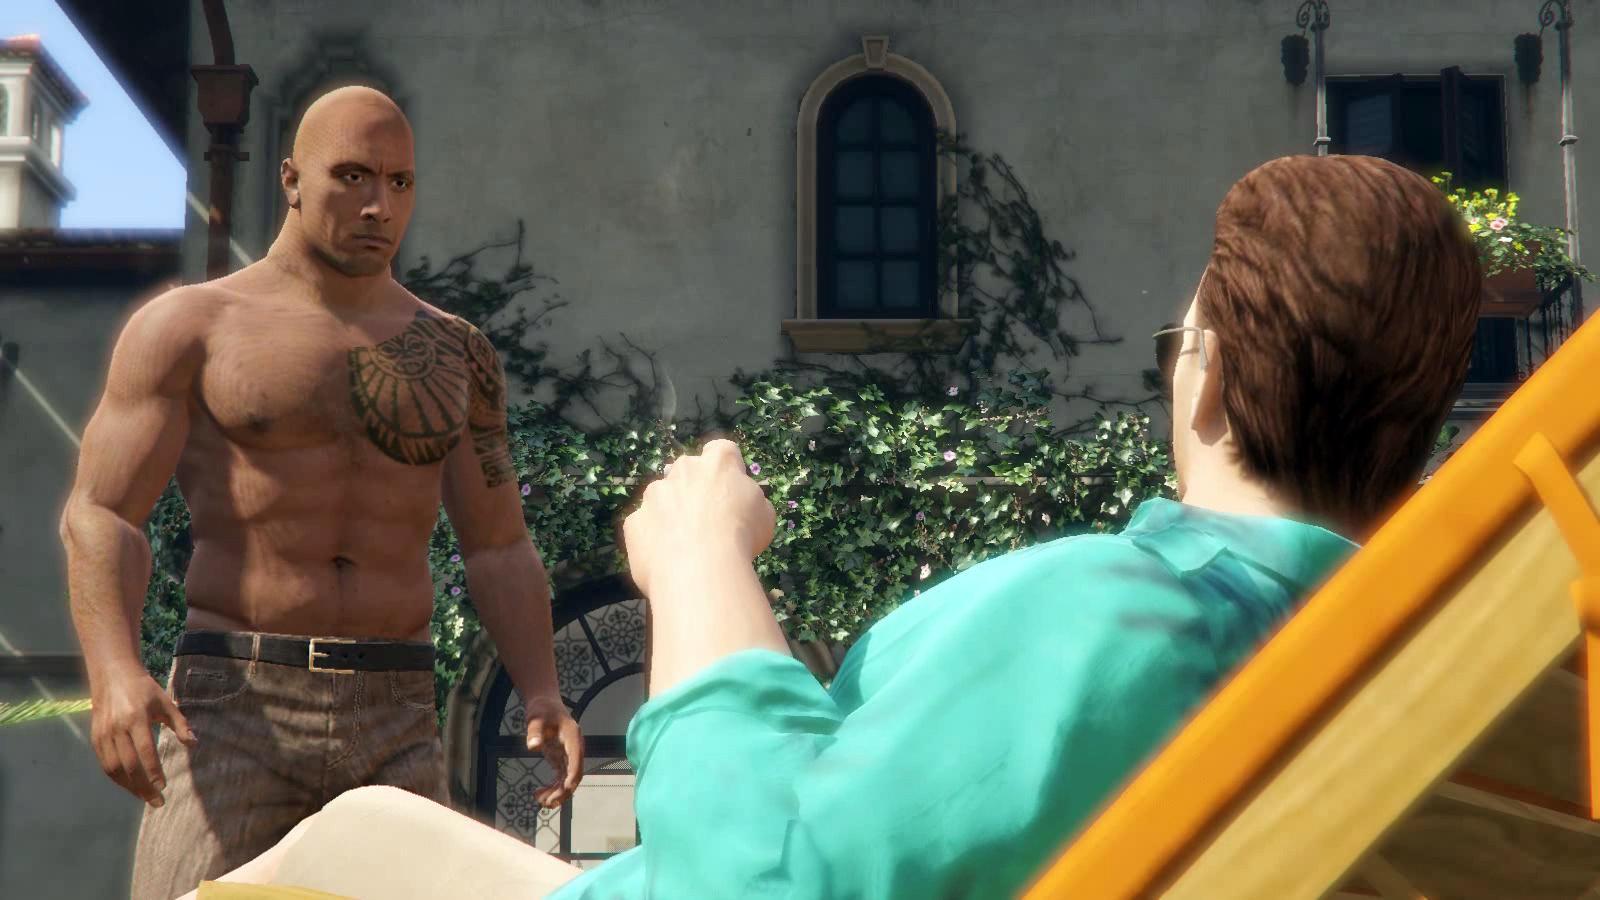 Dwayne Johnson and Michael Madsen [Player Mod] - GTA5-Mods com